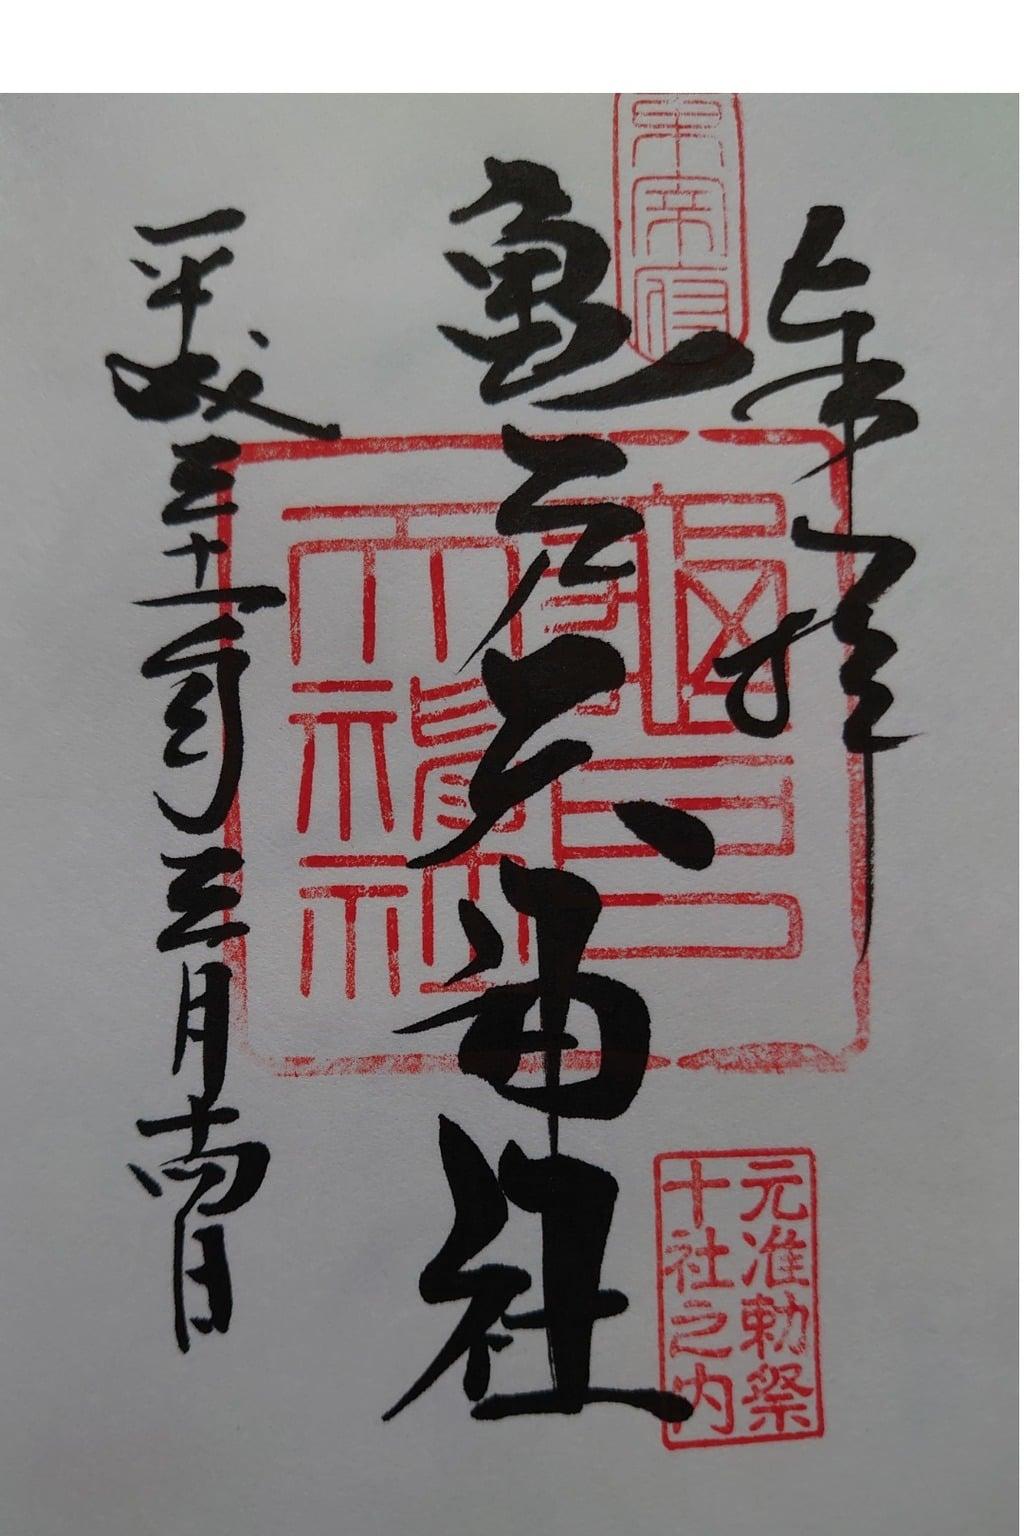 亀戸天神社の御朱印